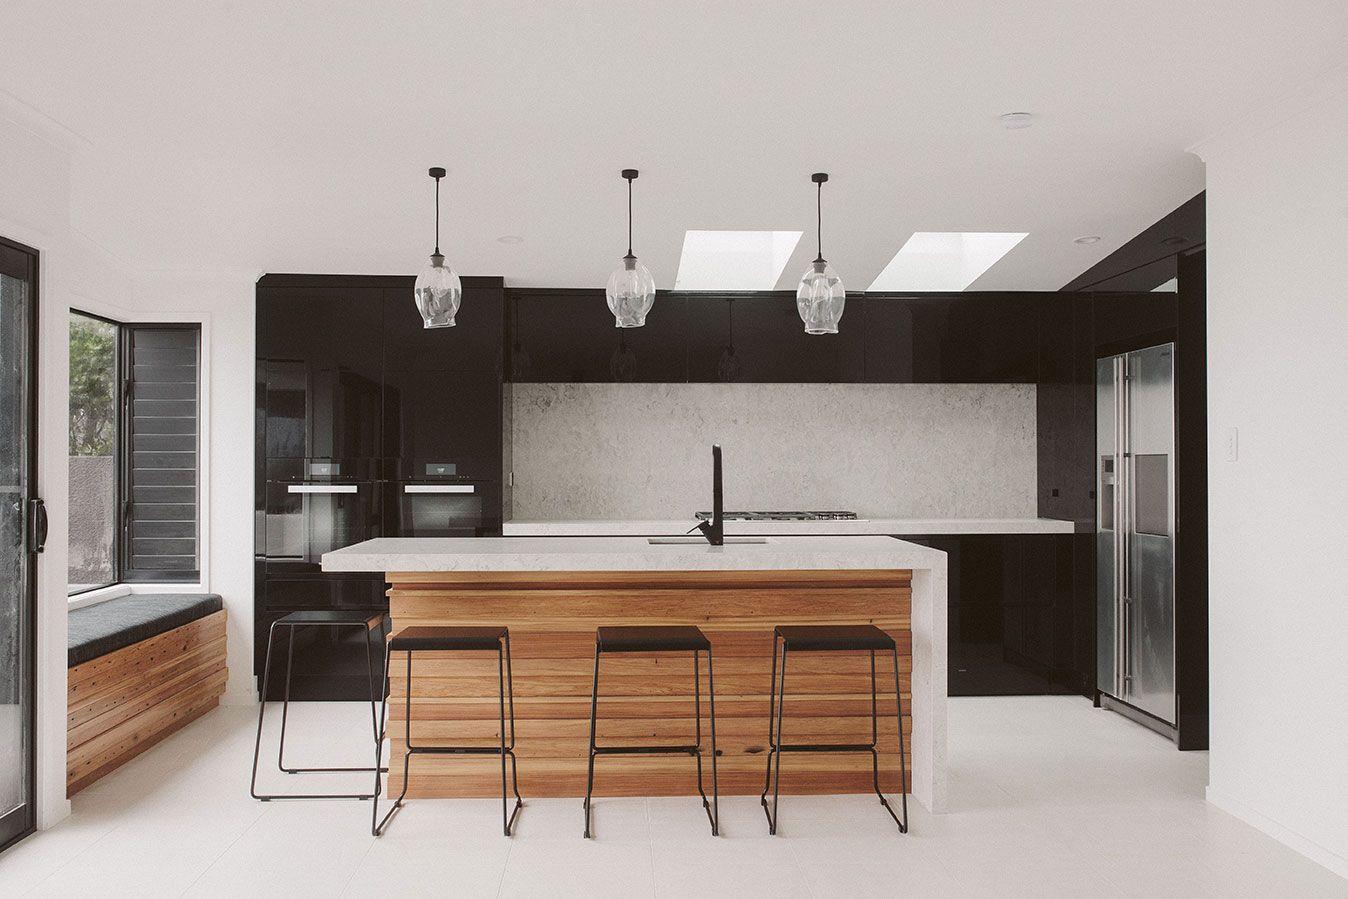 Seaside Seaside kitchen, Kitchen design, Renovations